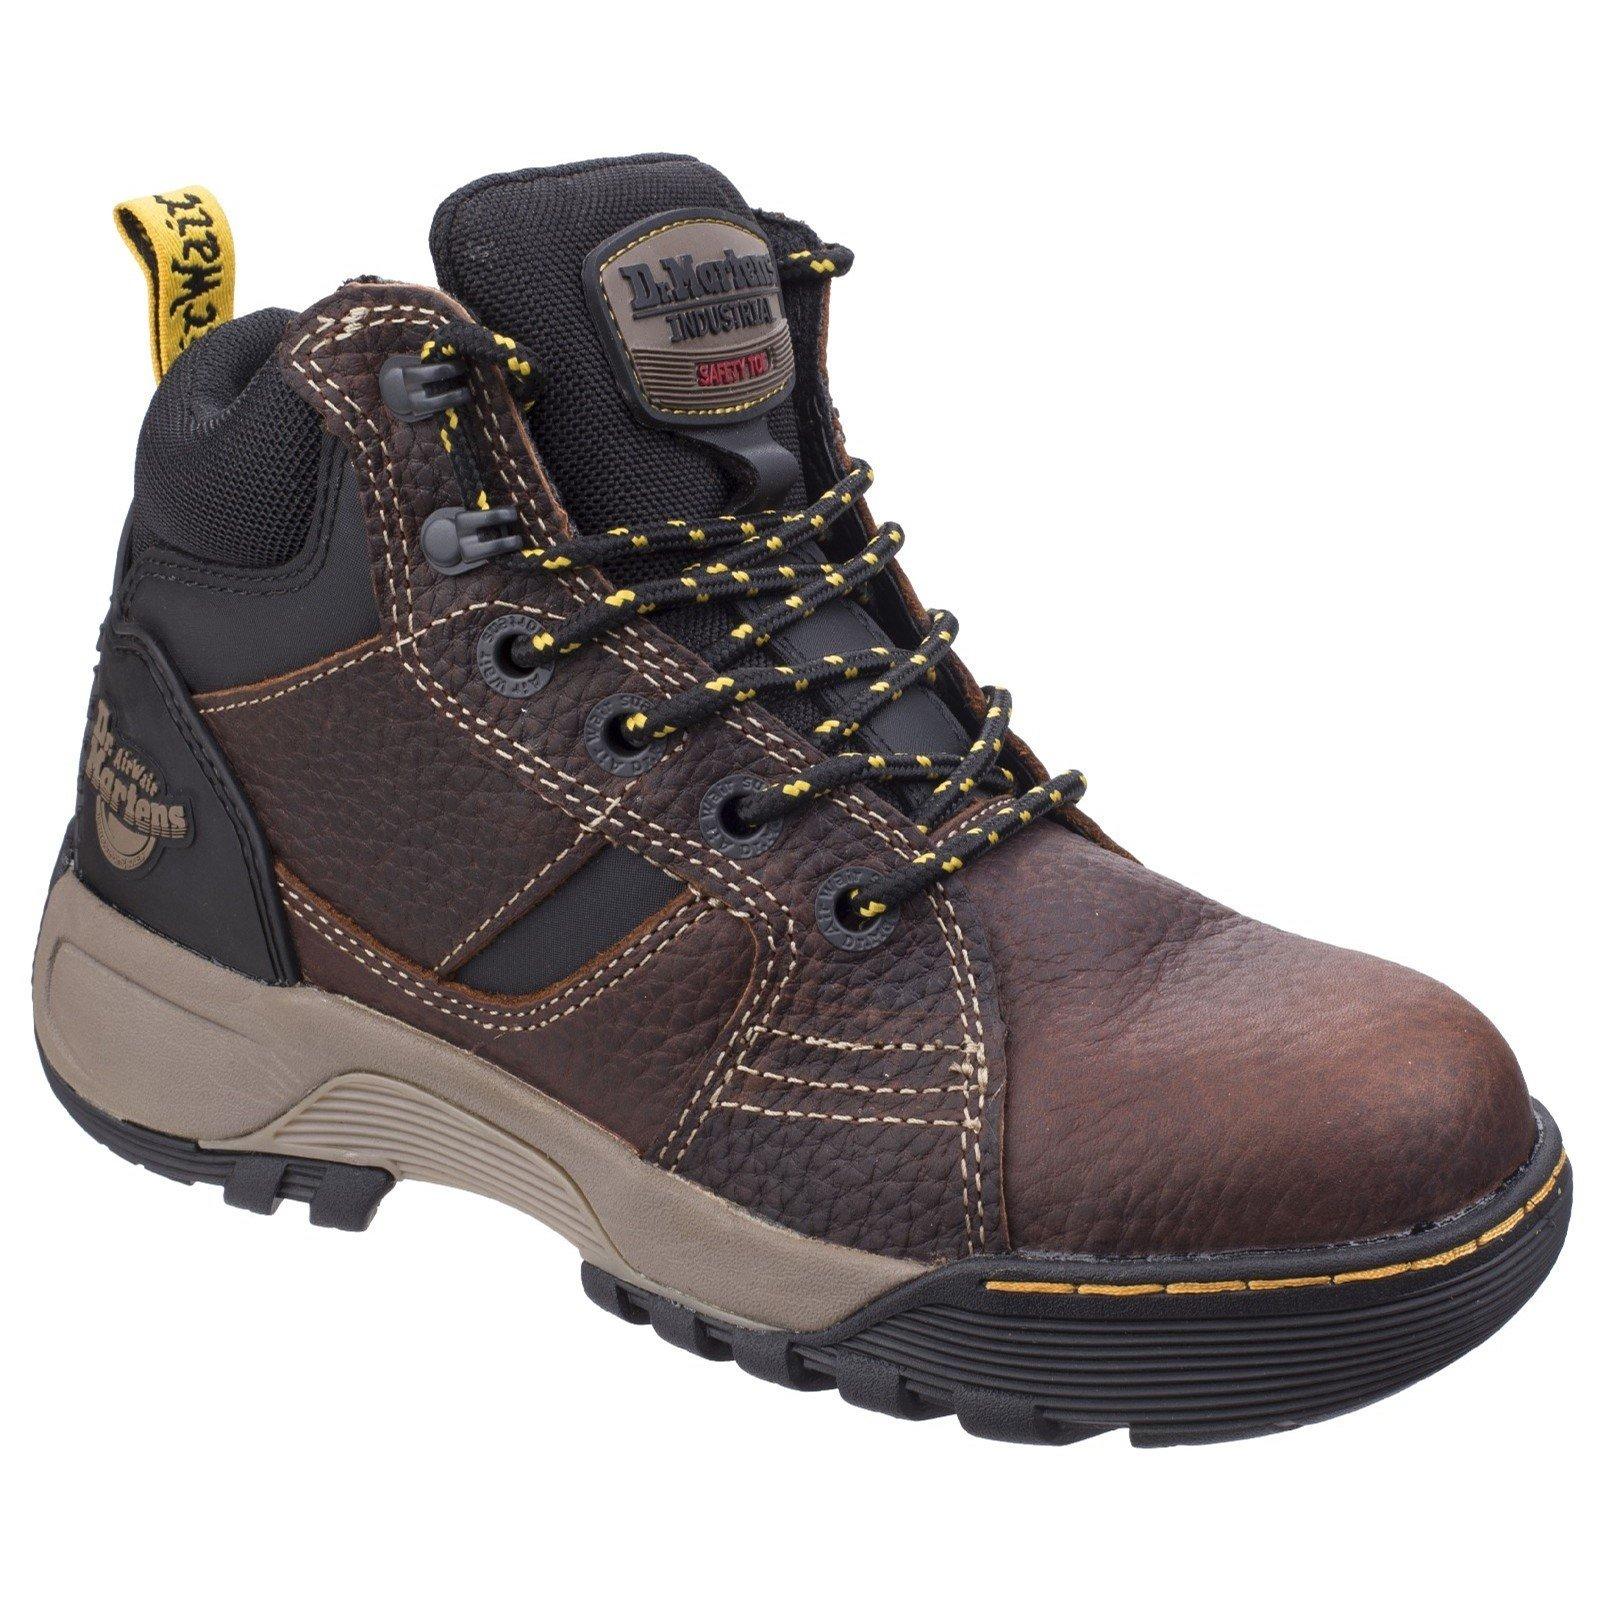 Dr Martens Men's Grapple Safety Boot Various Colours 26023 - Teak 11